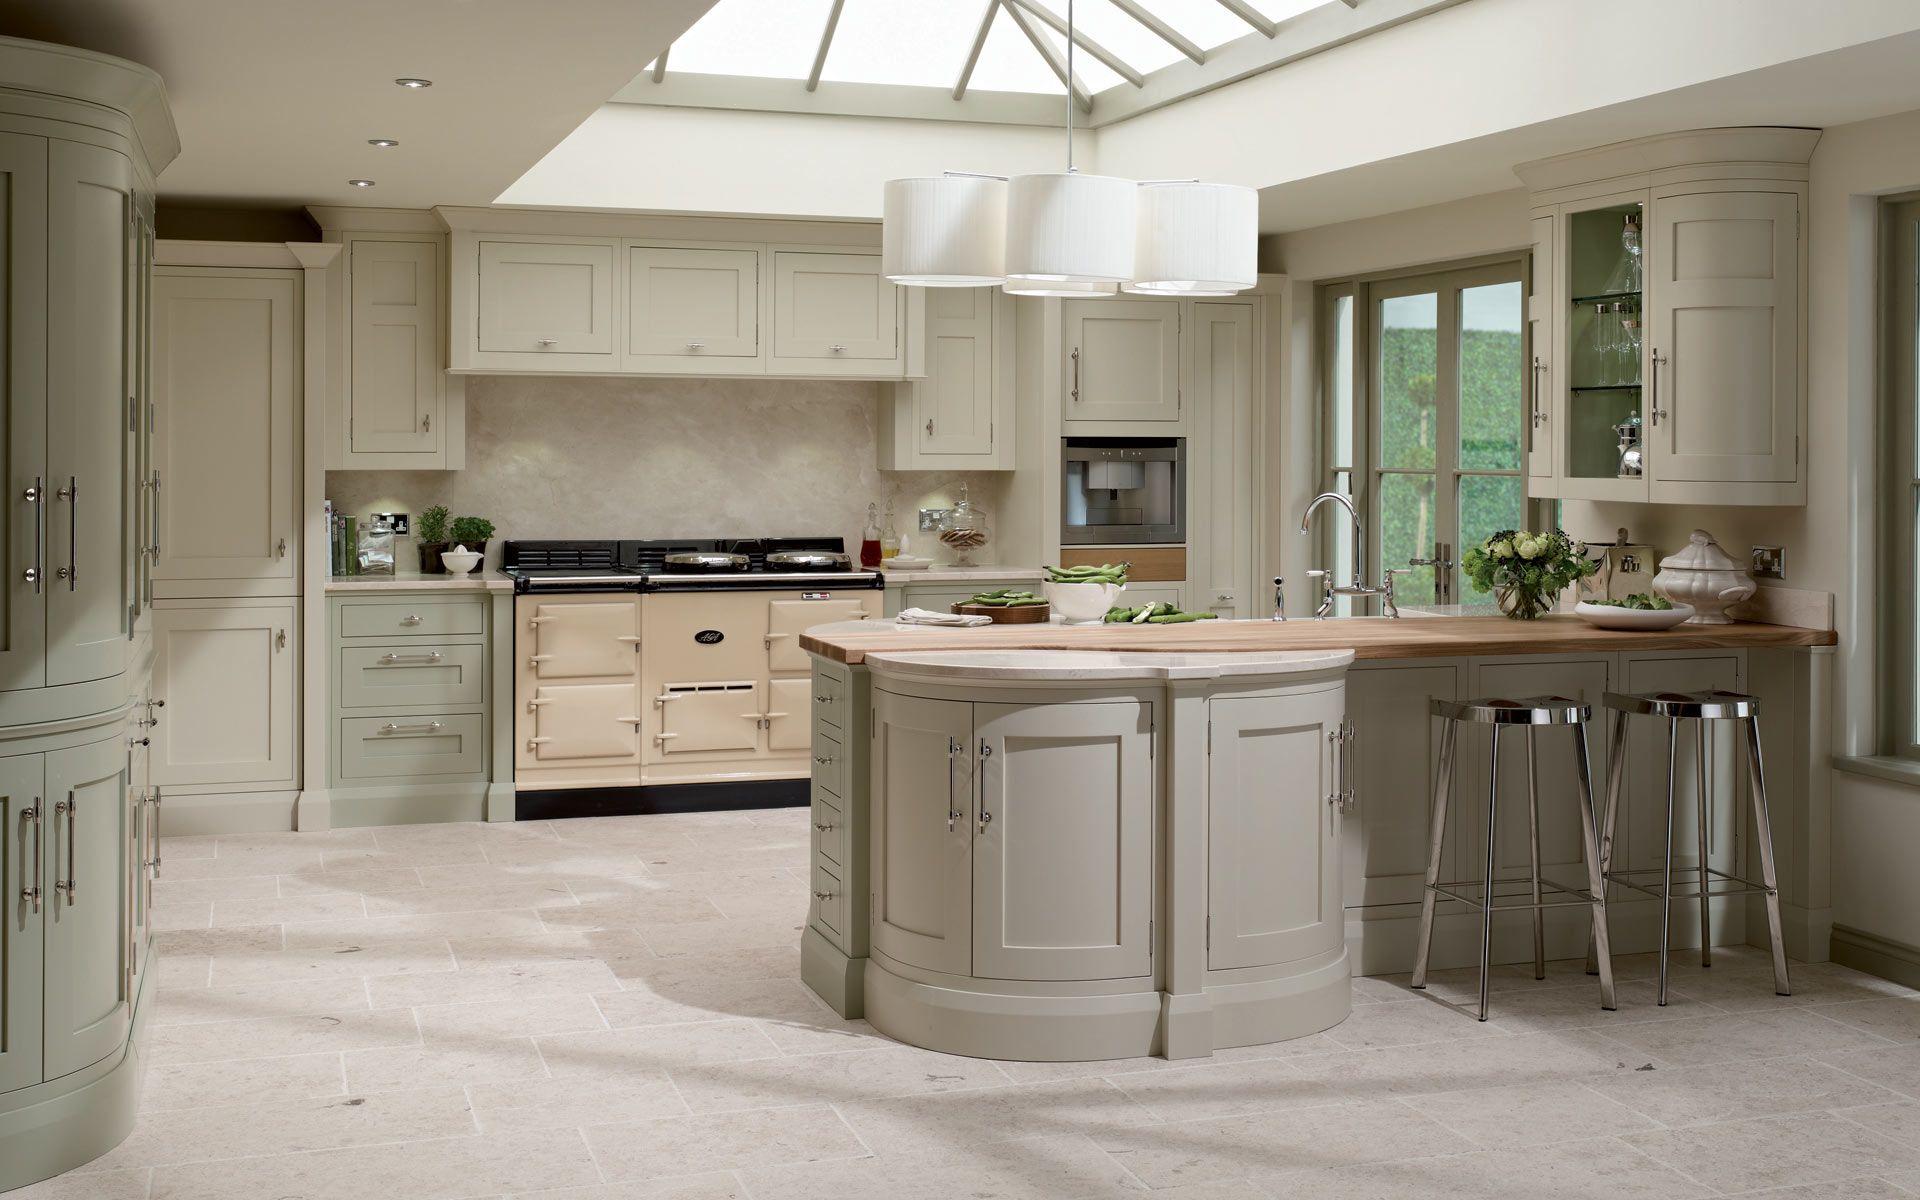 edwardian kitchen - Google Search | kitchen | Pinterest | Kitchens ...